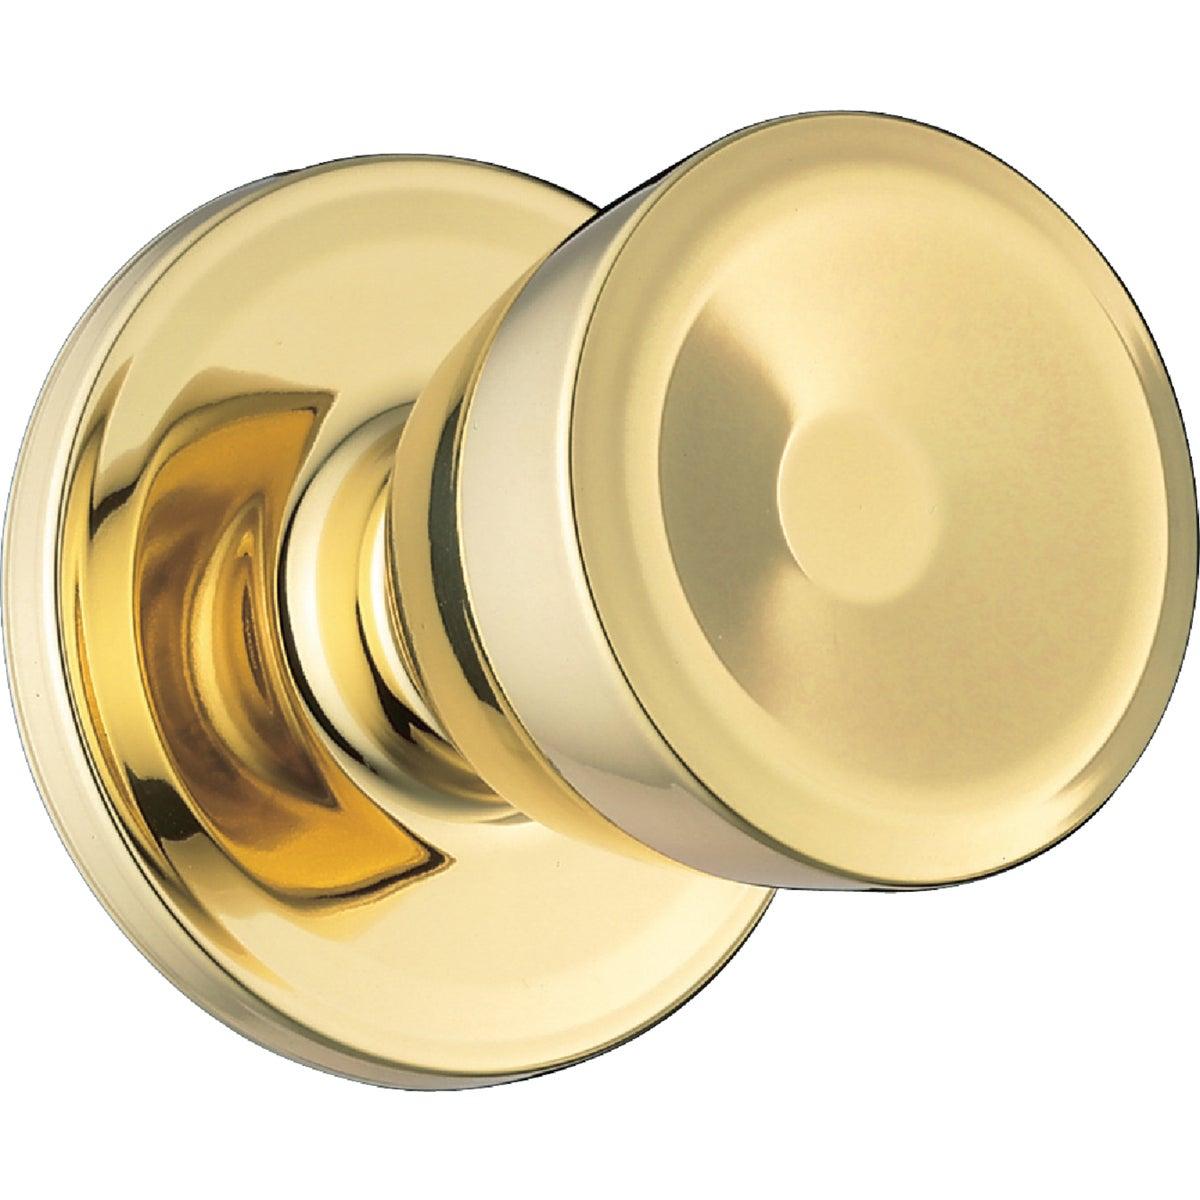 Weiser Lock PB BEVERLY PASS LOCKSET GAC101 B3 MS 6LR1